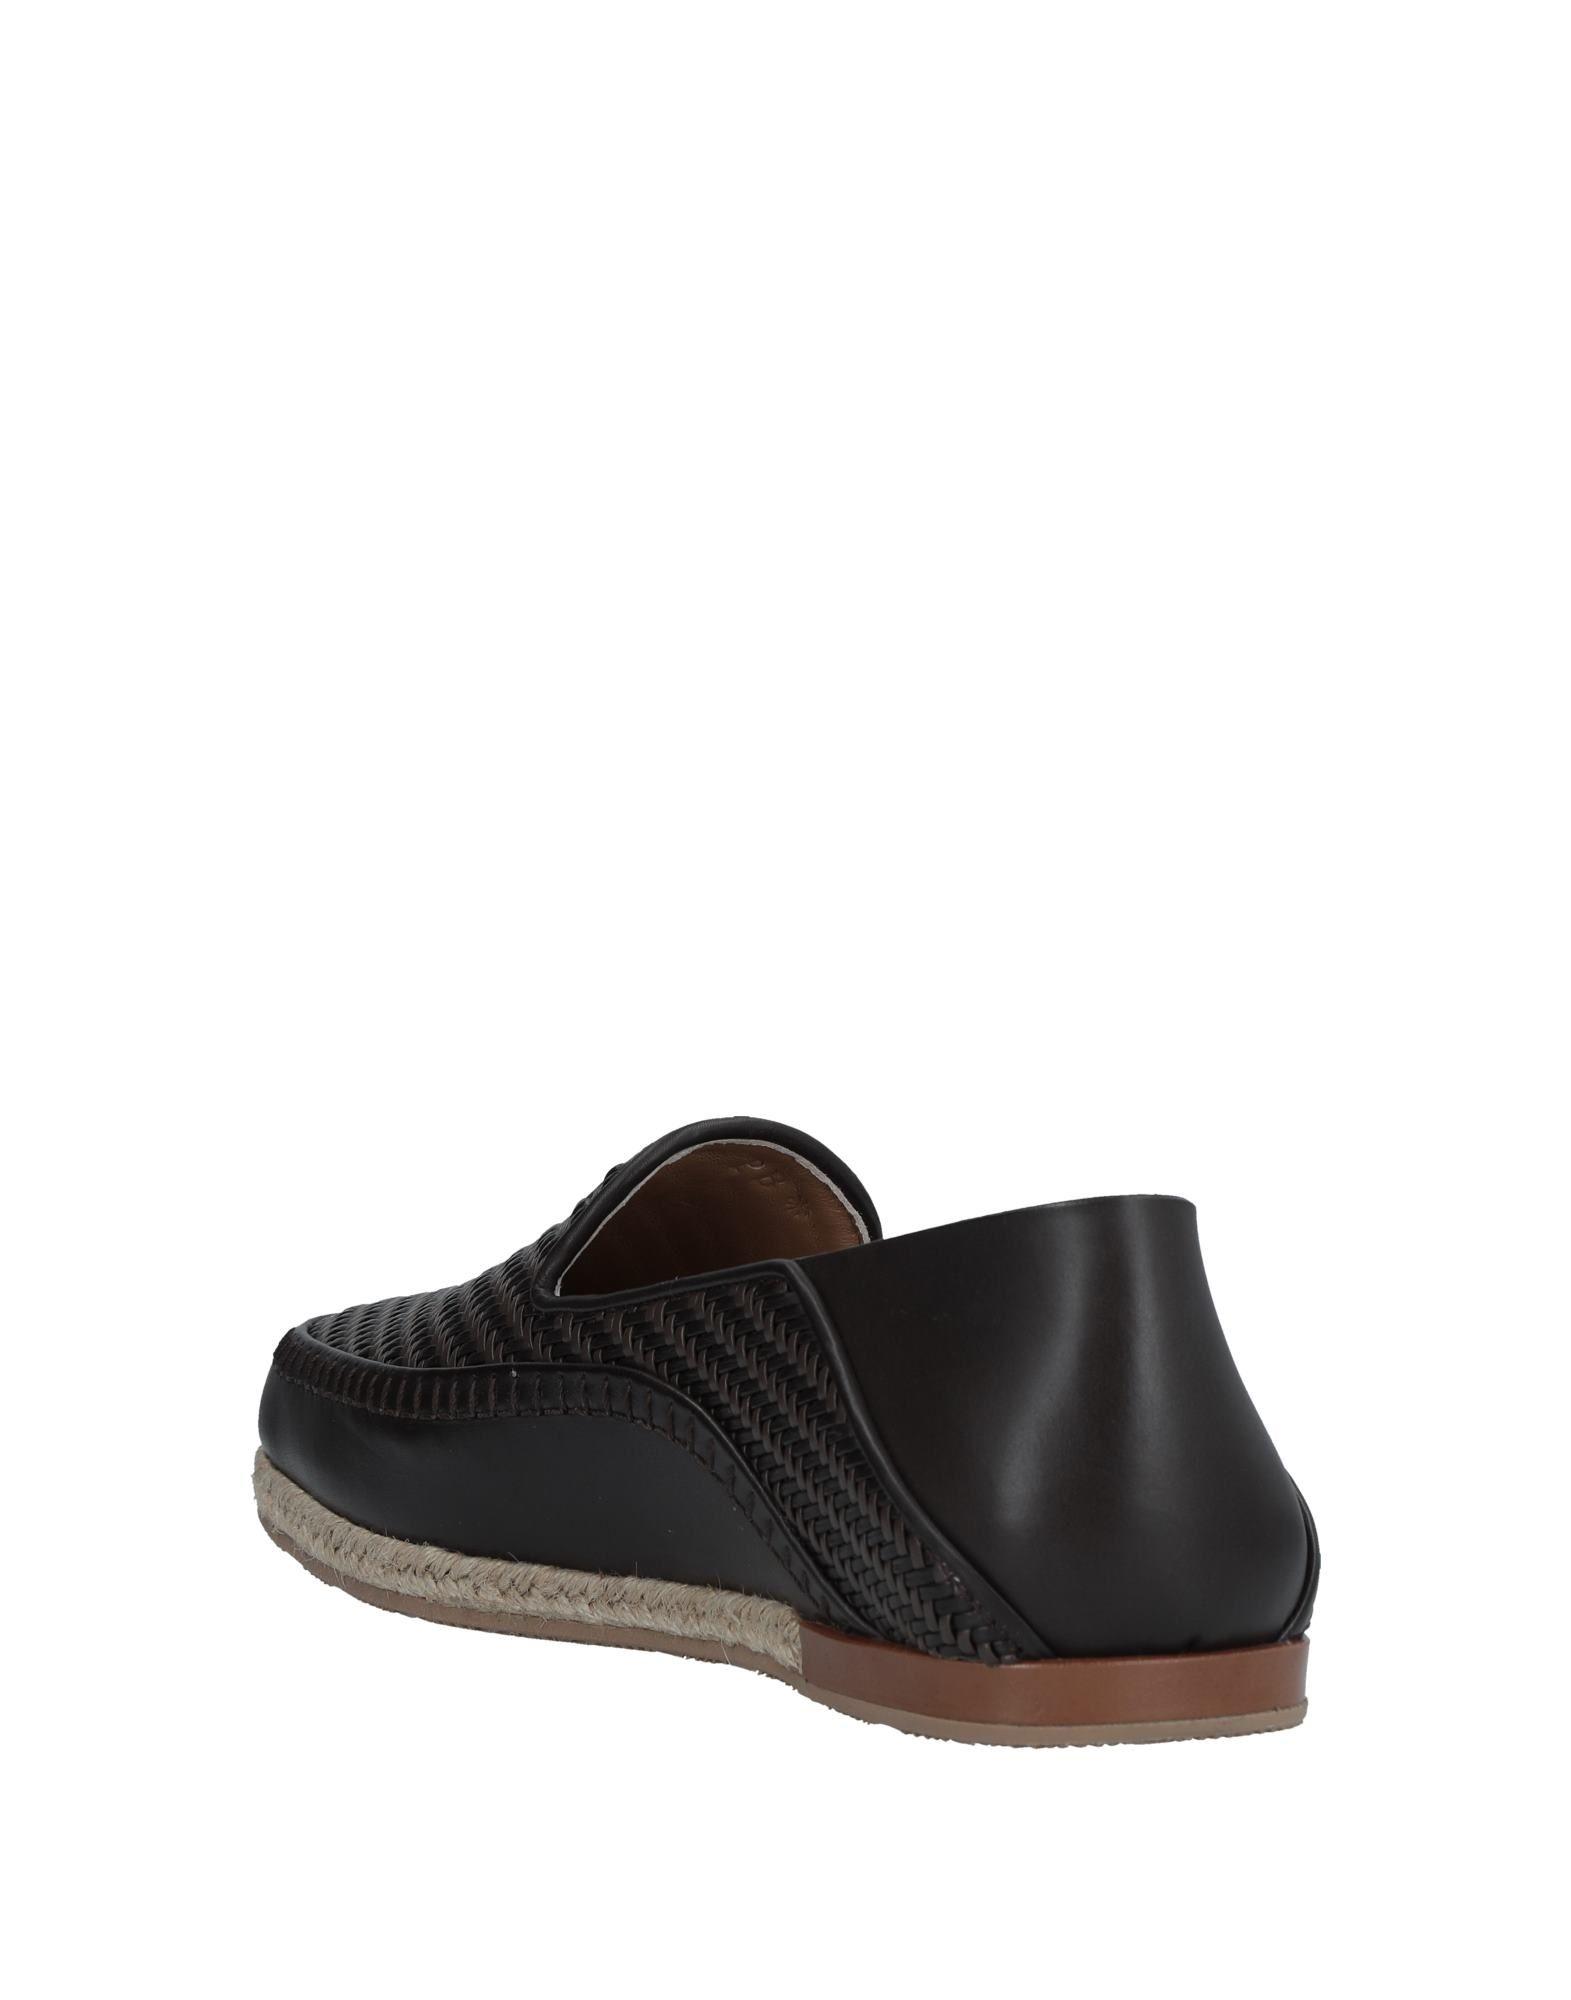 Ermenegildo 11518808DR Zegna Mokassins Herren  11518808DR Ermenegildo Gute Qualität beliebte Schuhe c645fc